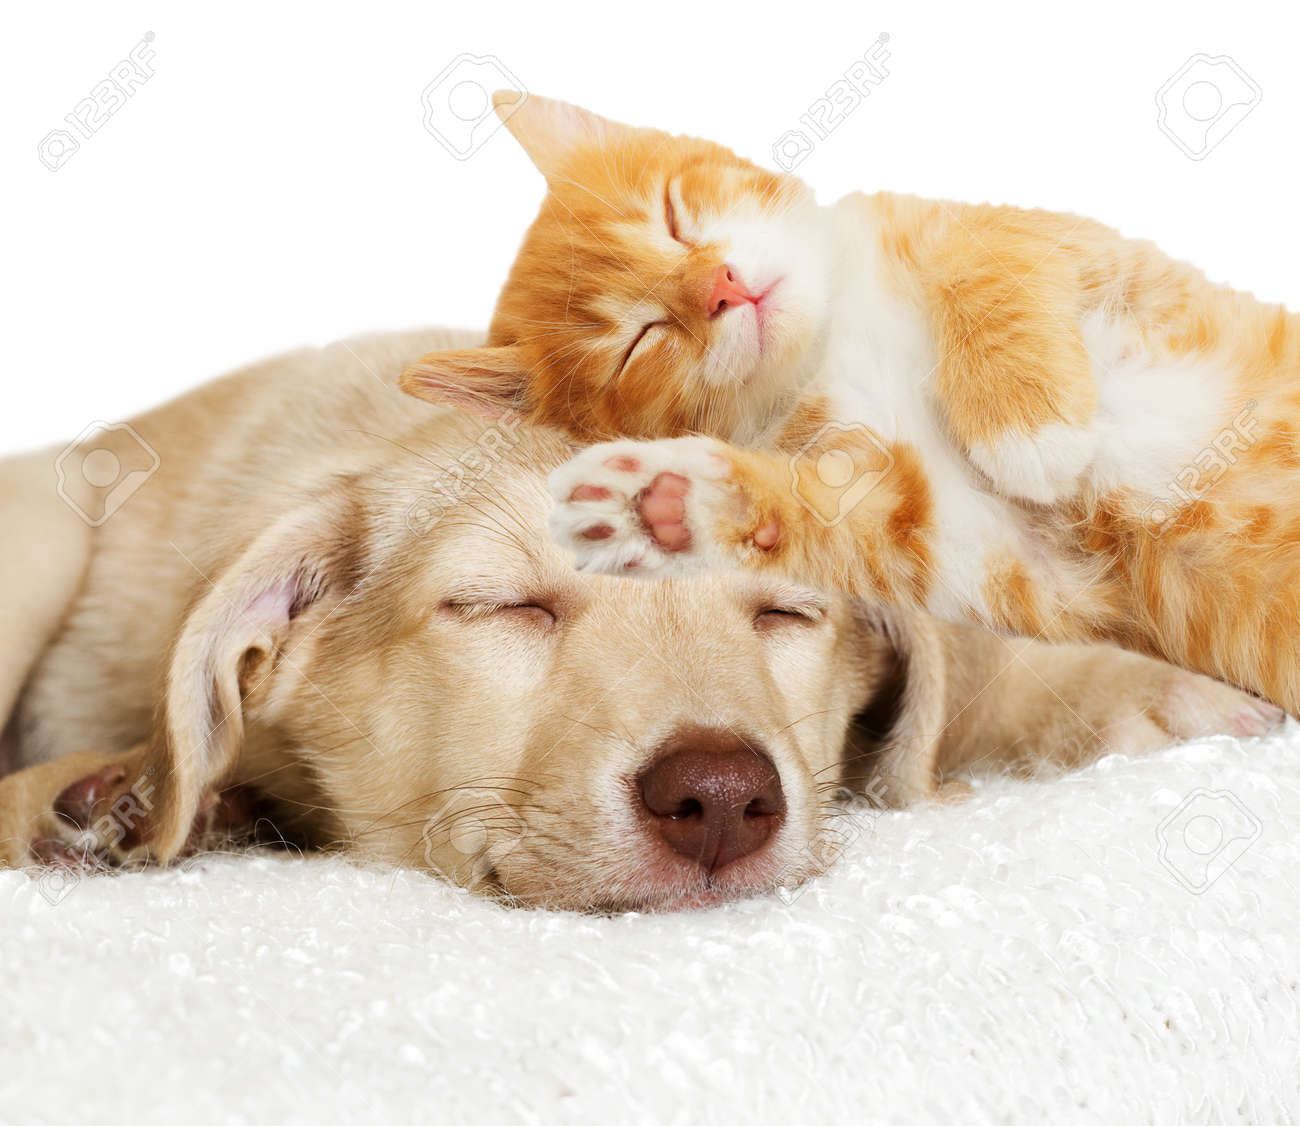 sad puppy lying - 50880332